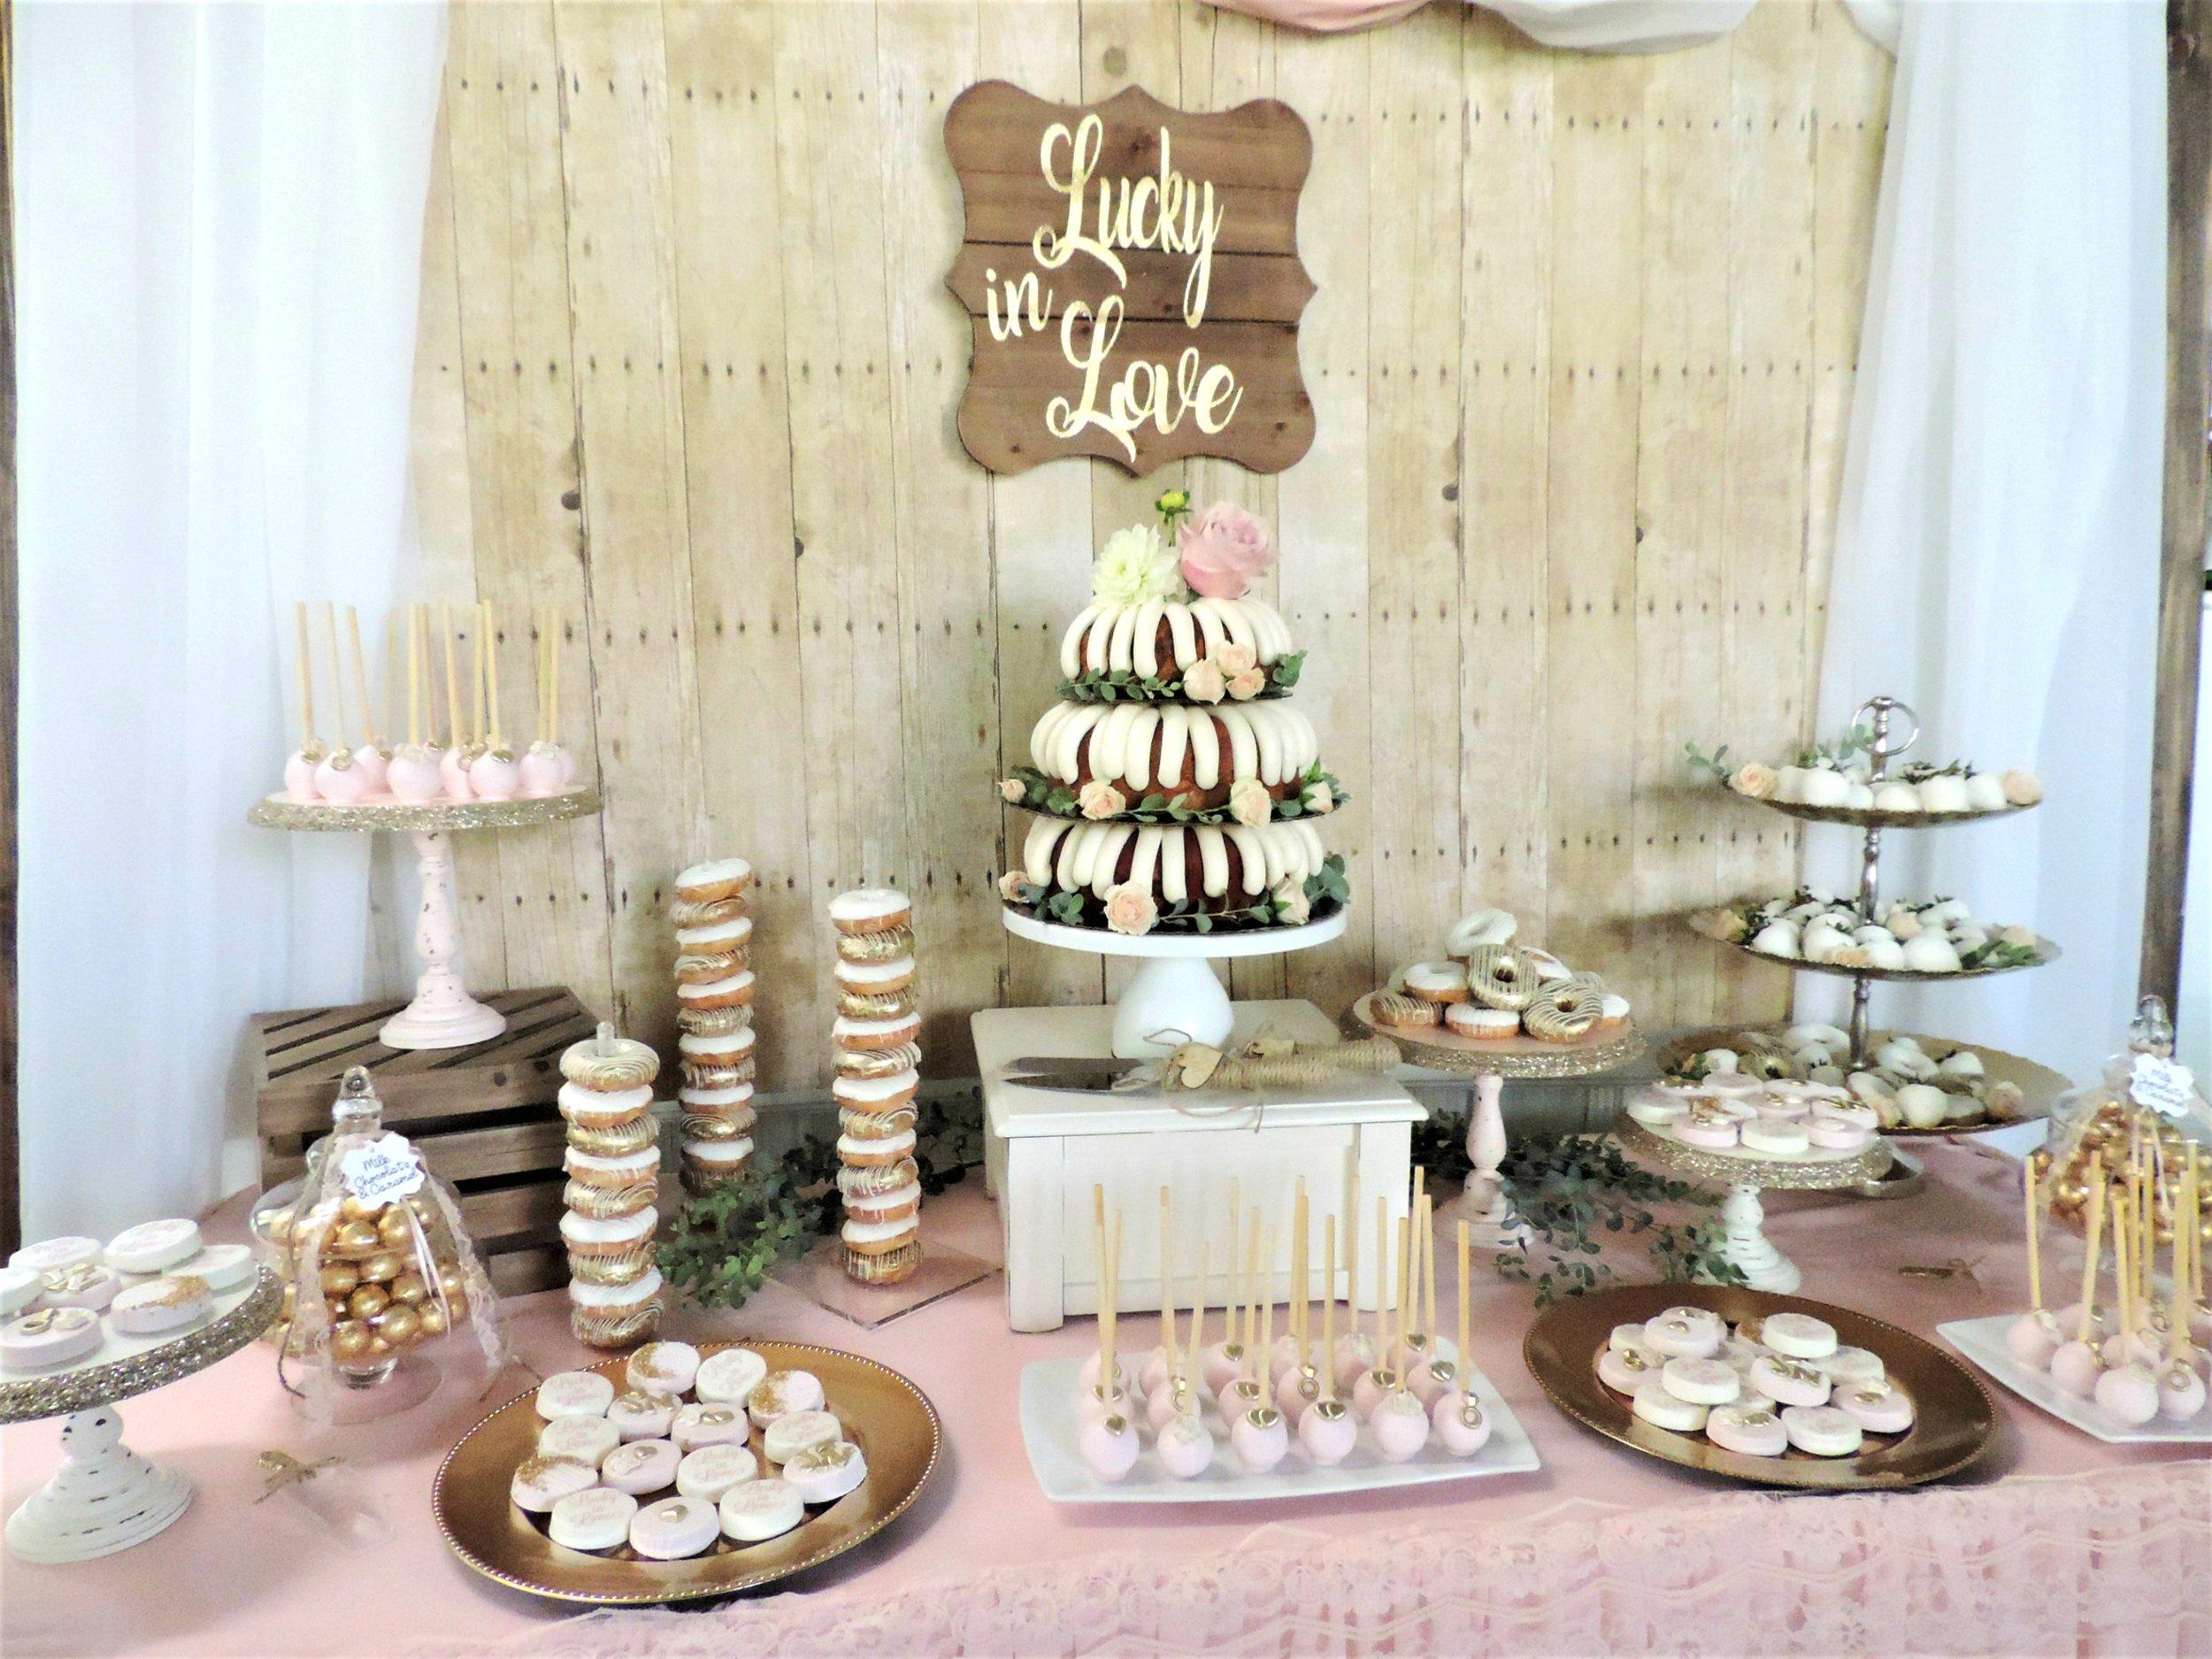 Rustic Wedding-Blush pink wedding-wedding cake-nothing bundt cake-bundt wedding cake-wedding-wedding dessert table-www.SugarPartiesLA.com.jpg